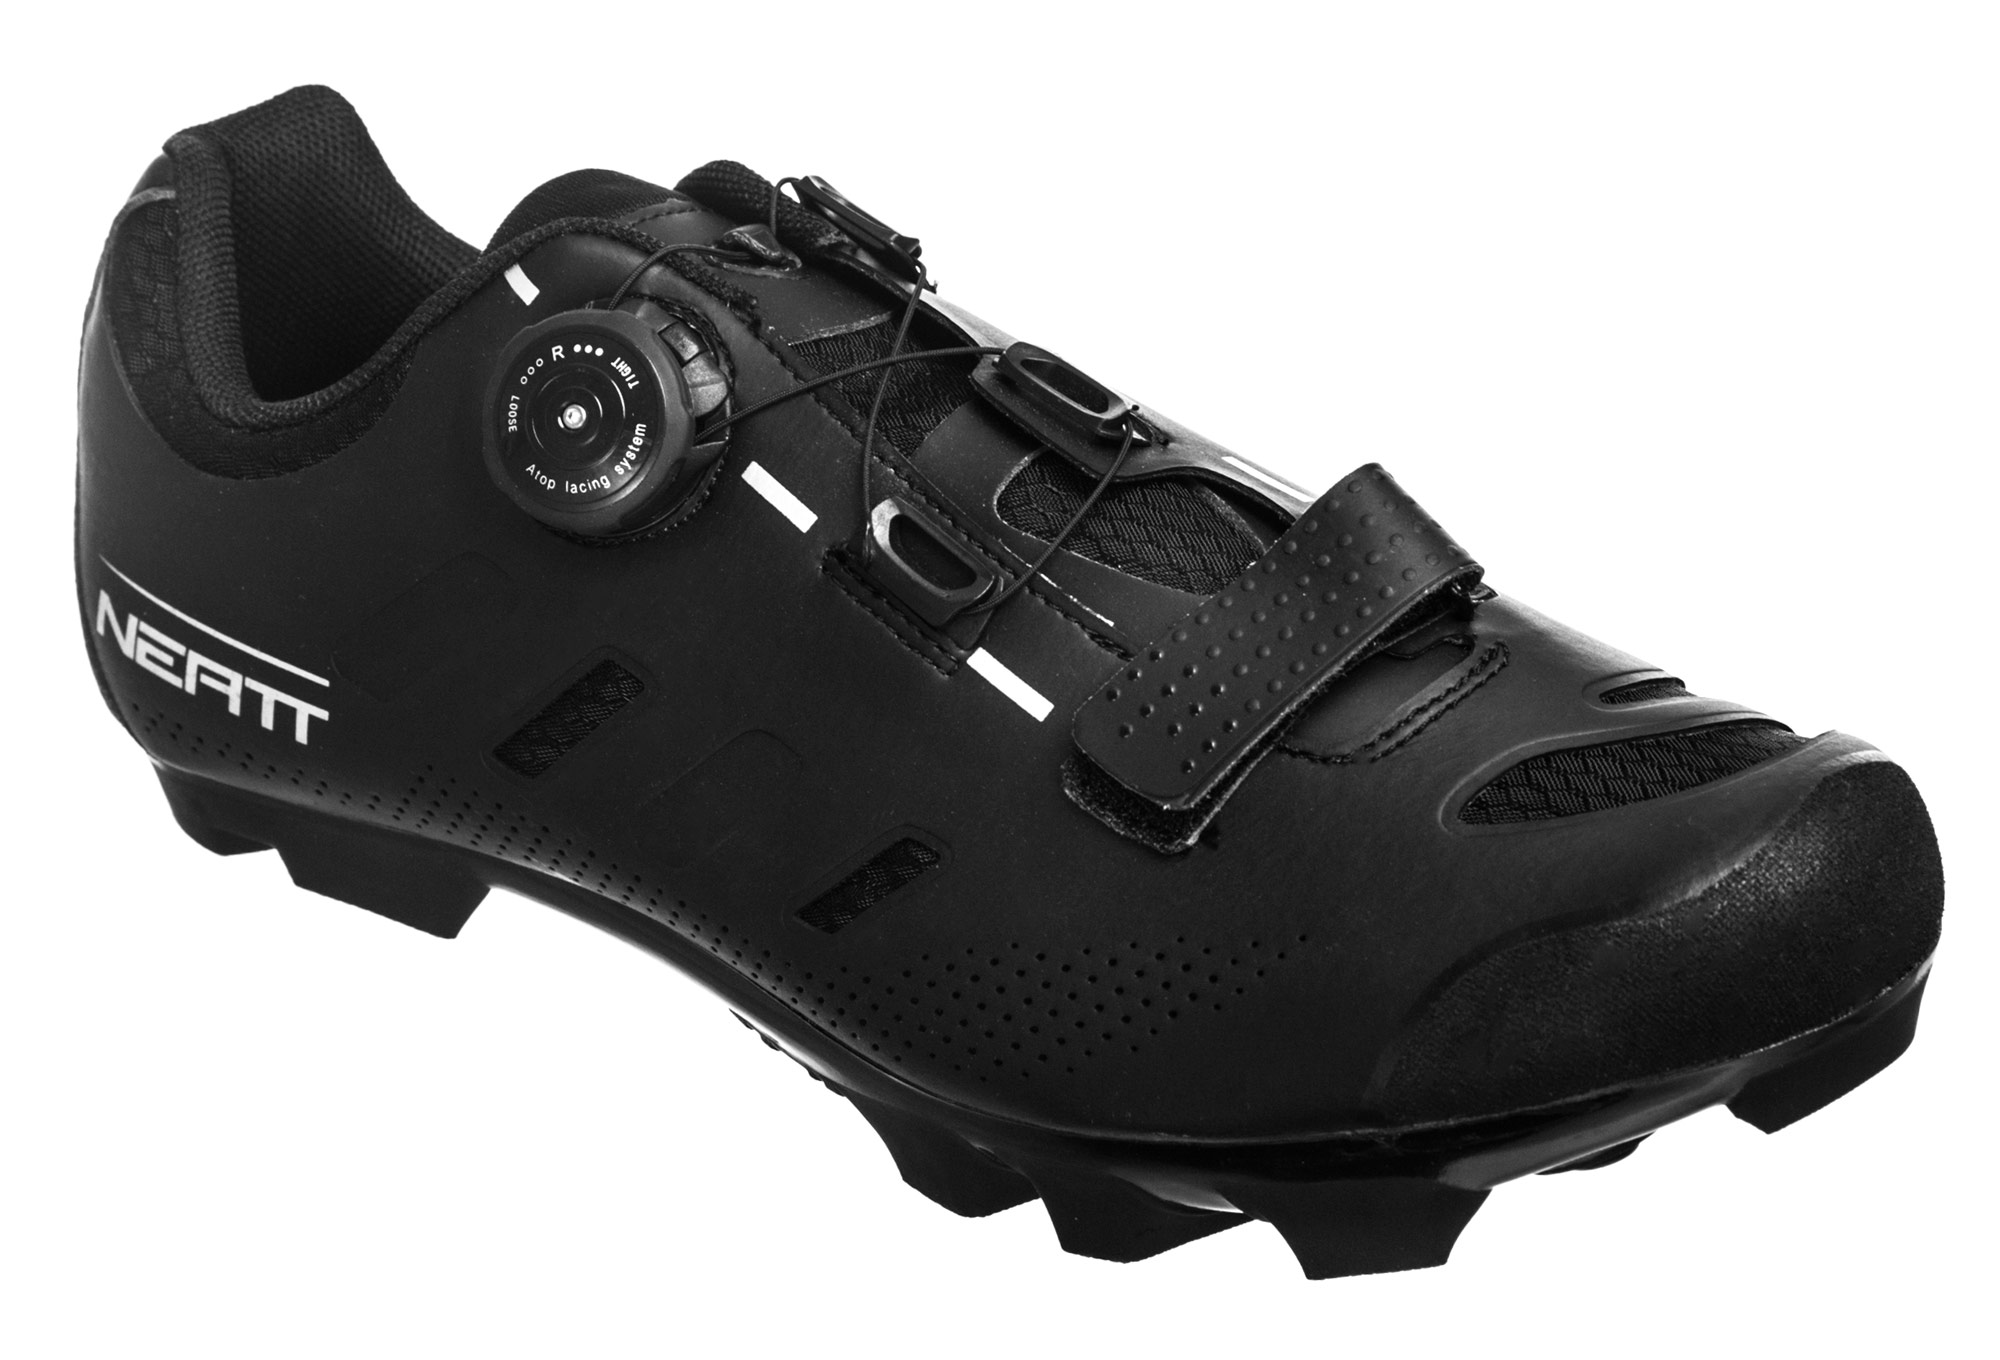 Basalte Noir Neatt Vtt Srdhtxbqc Chaussures Elite SVGqMUzp